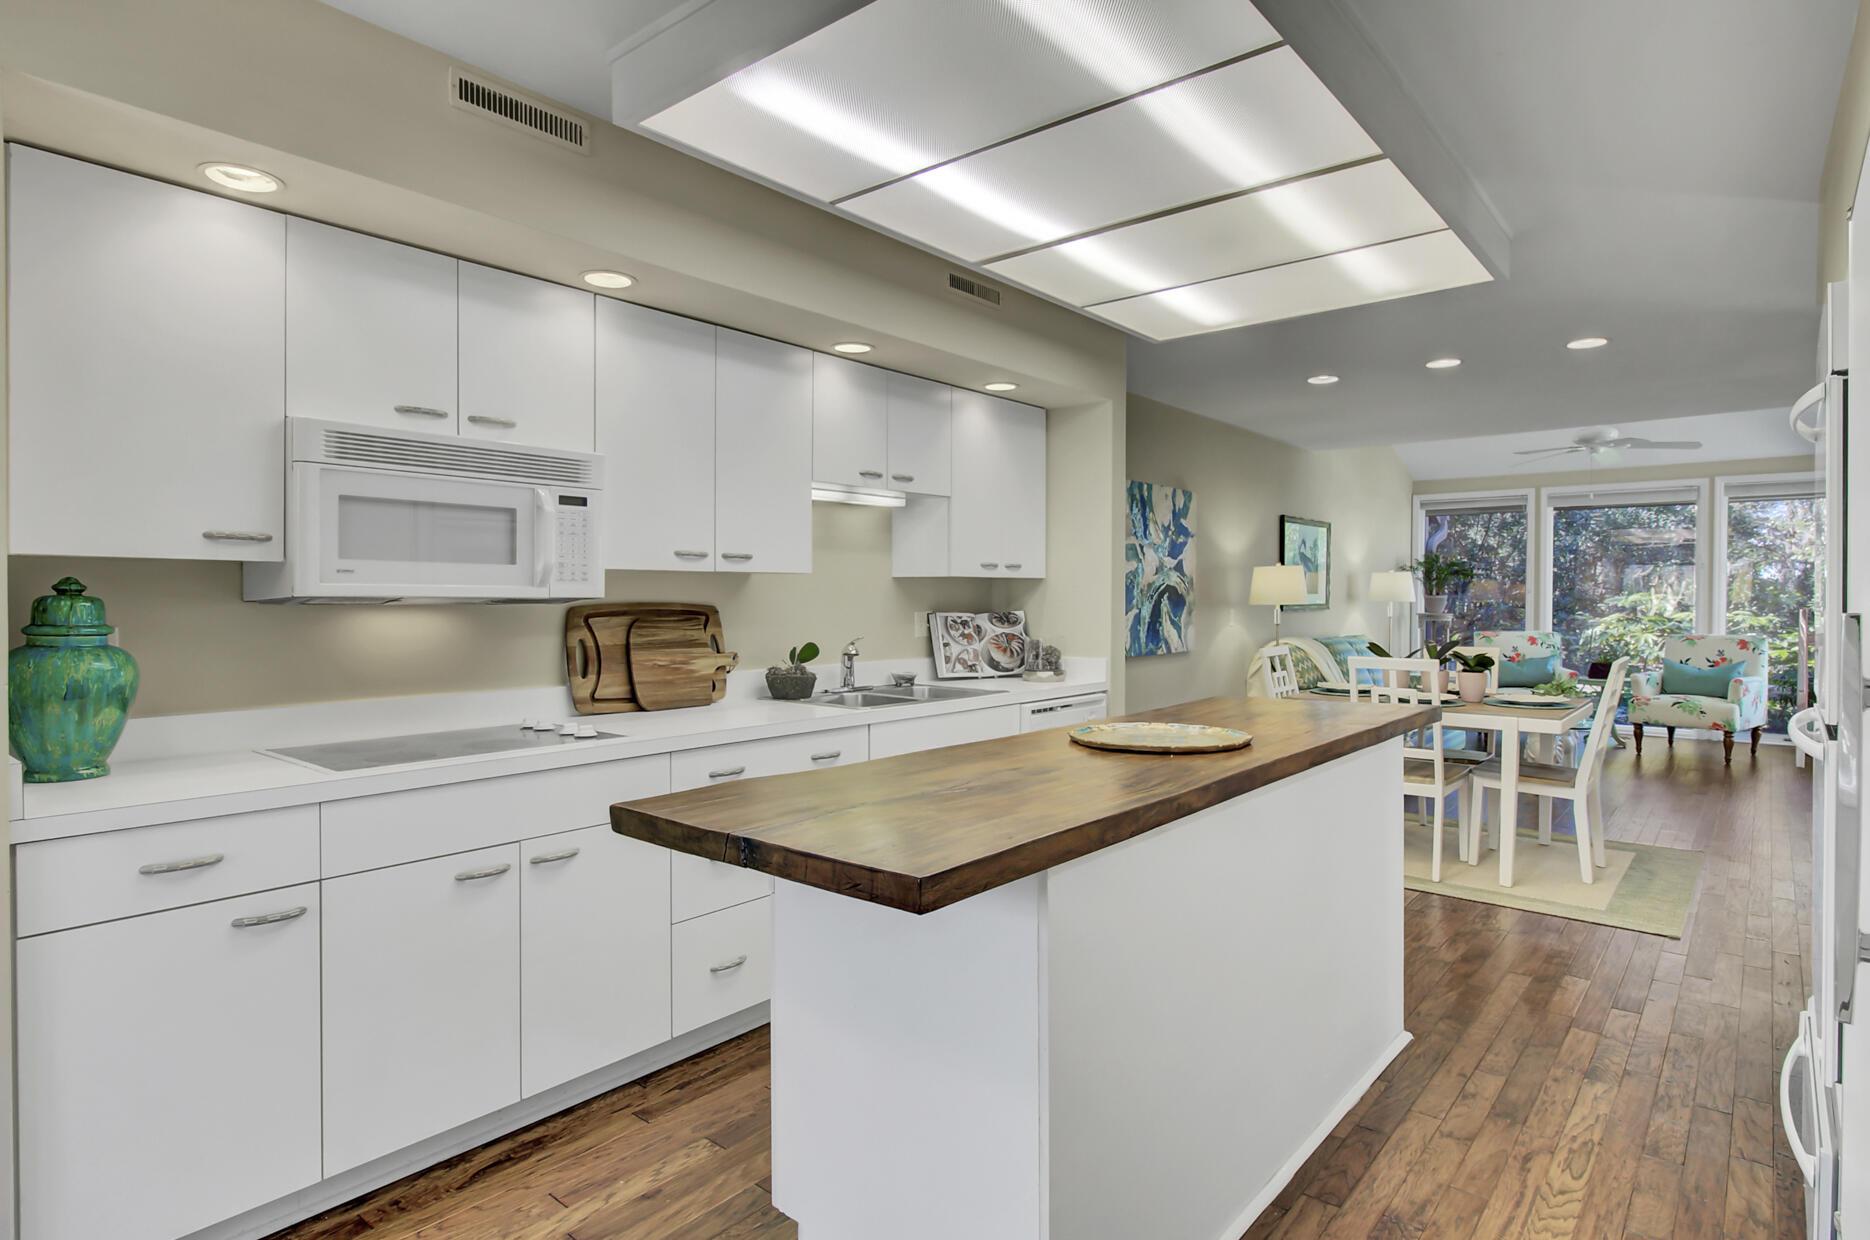 Wappoo Creek Place Homes For Sale - 29 Wappoo Creek, Charleston, SC - 18